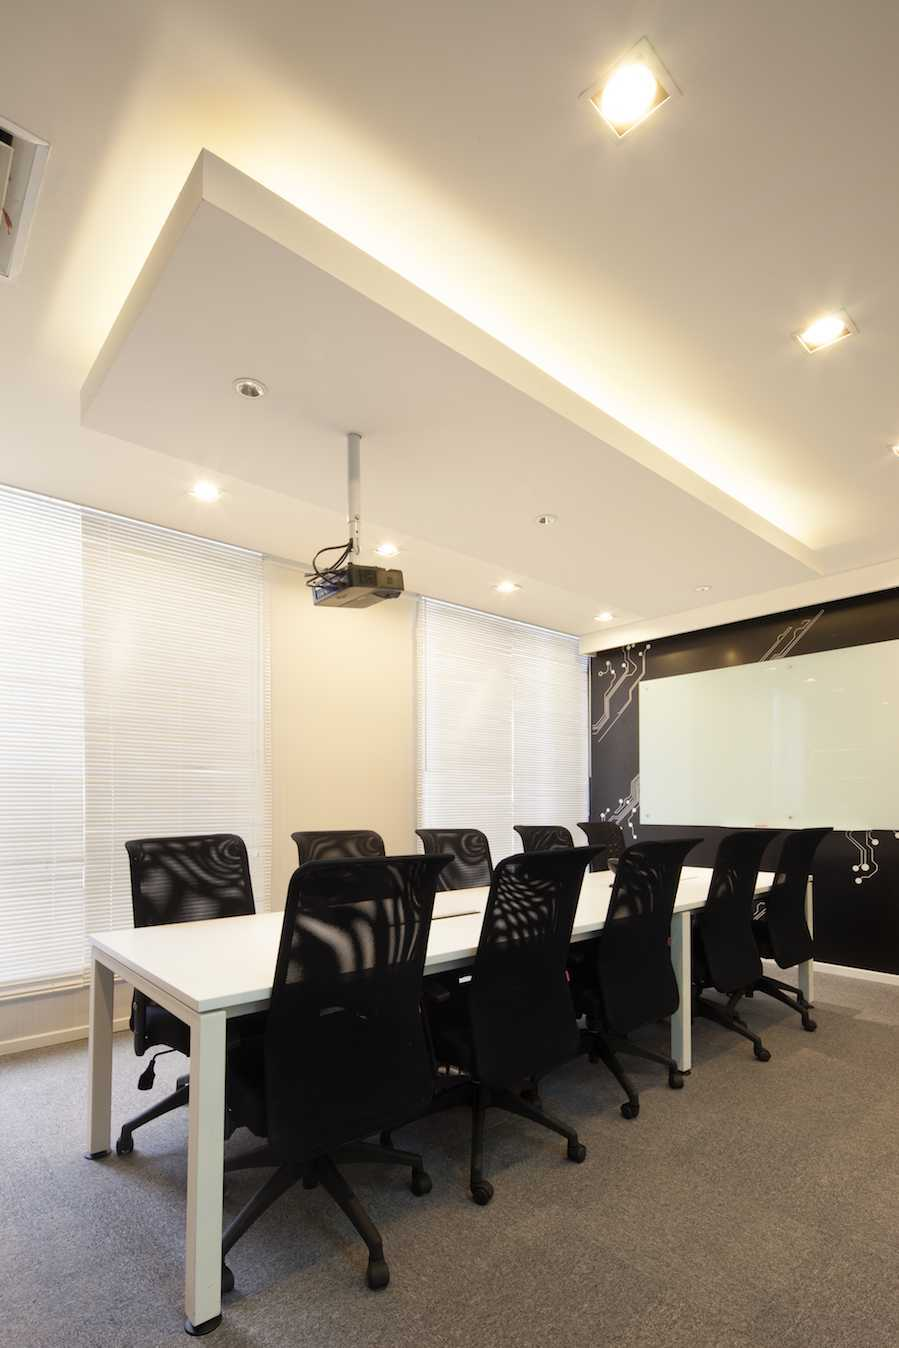 Pt Asa Adiguna Just Commodity Menara Thamrin Building Menara Thamrin Building Meeting Room   24523